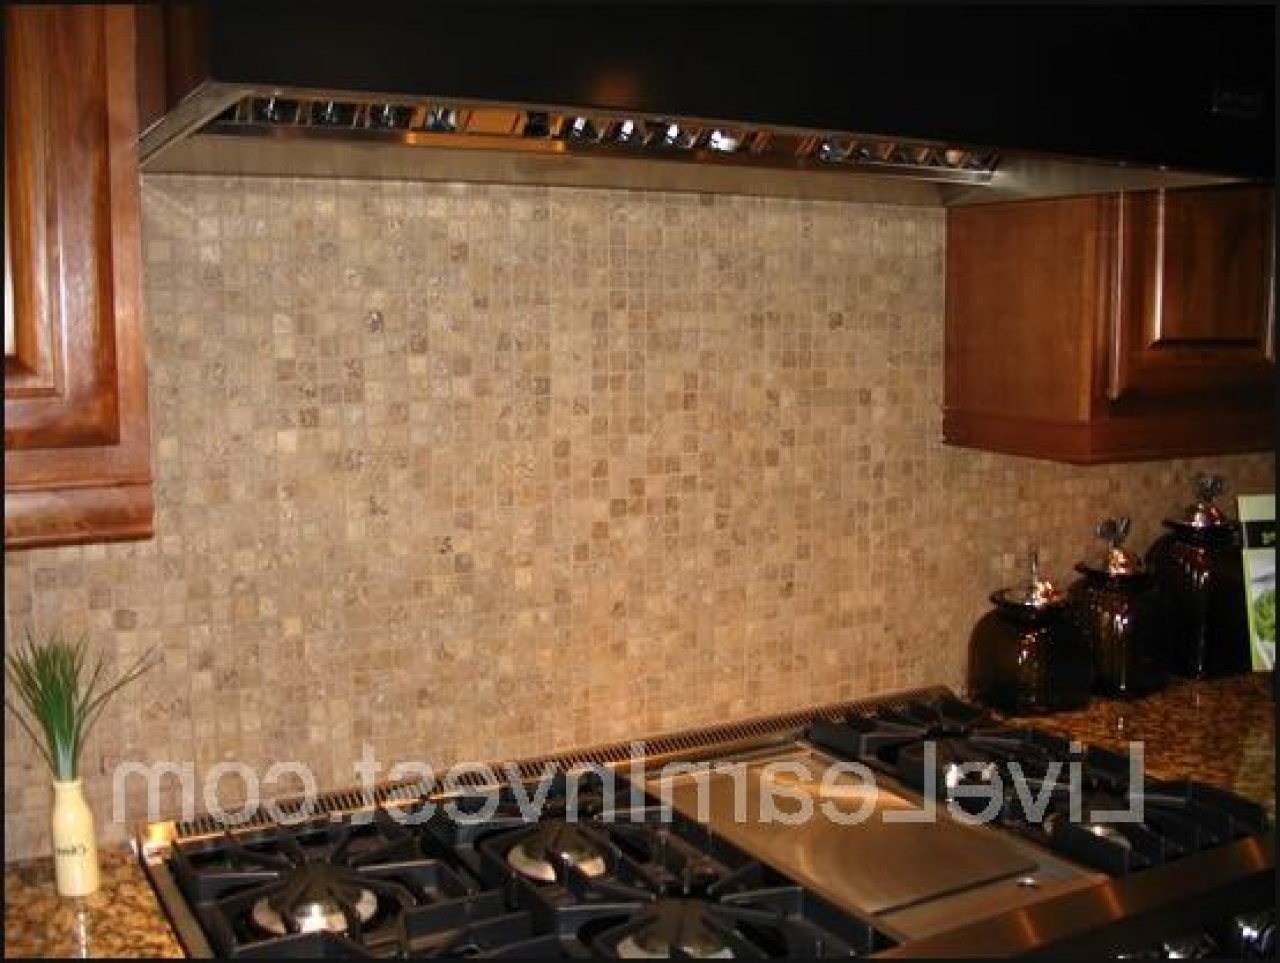 9+] Wallpaper for Kitchen Backsplashes on WallpaperSafari